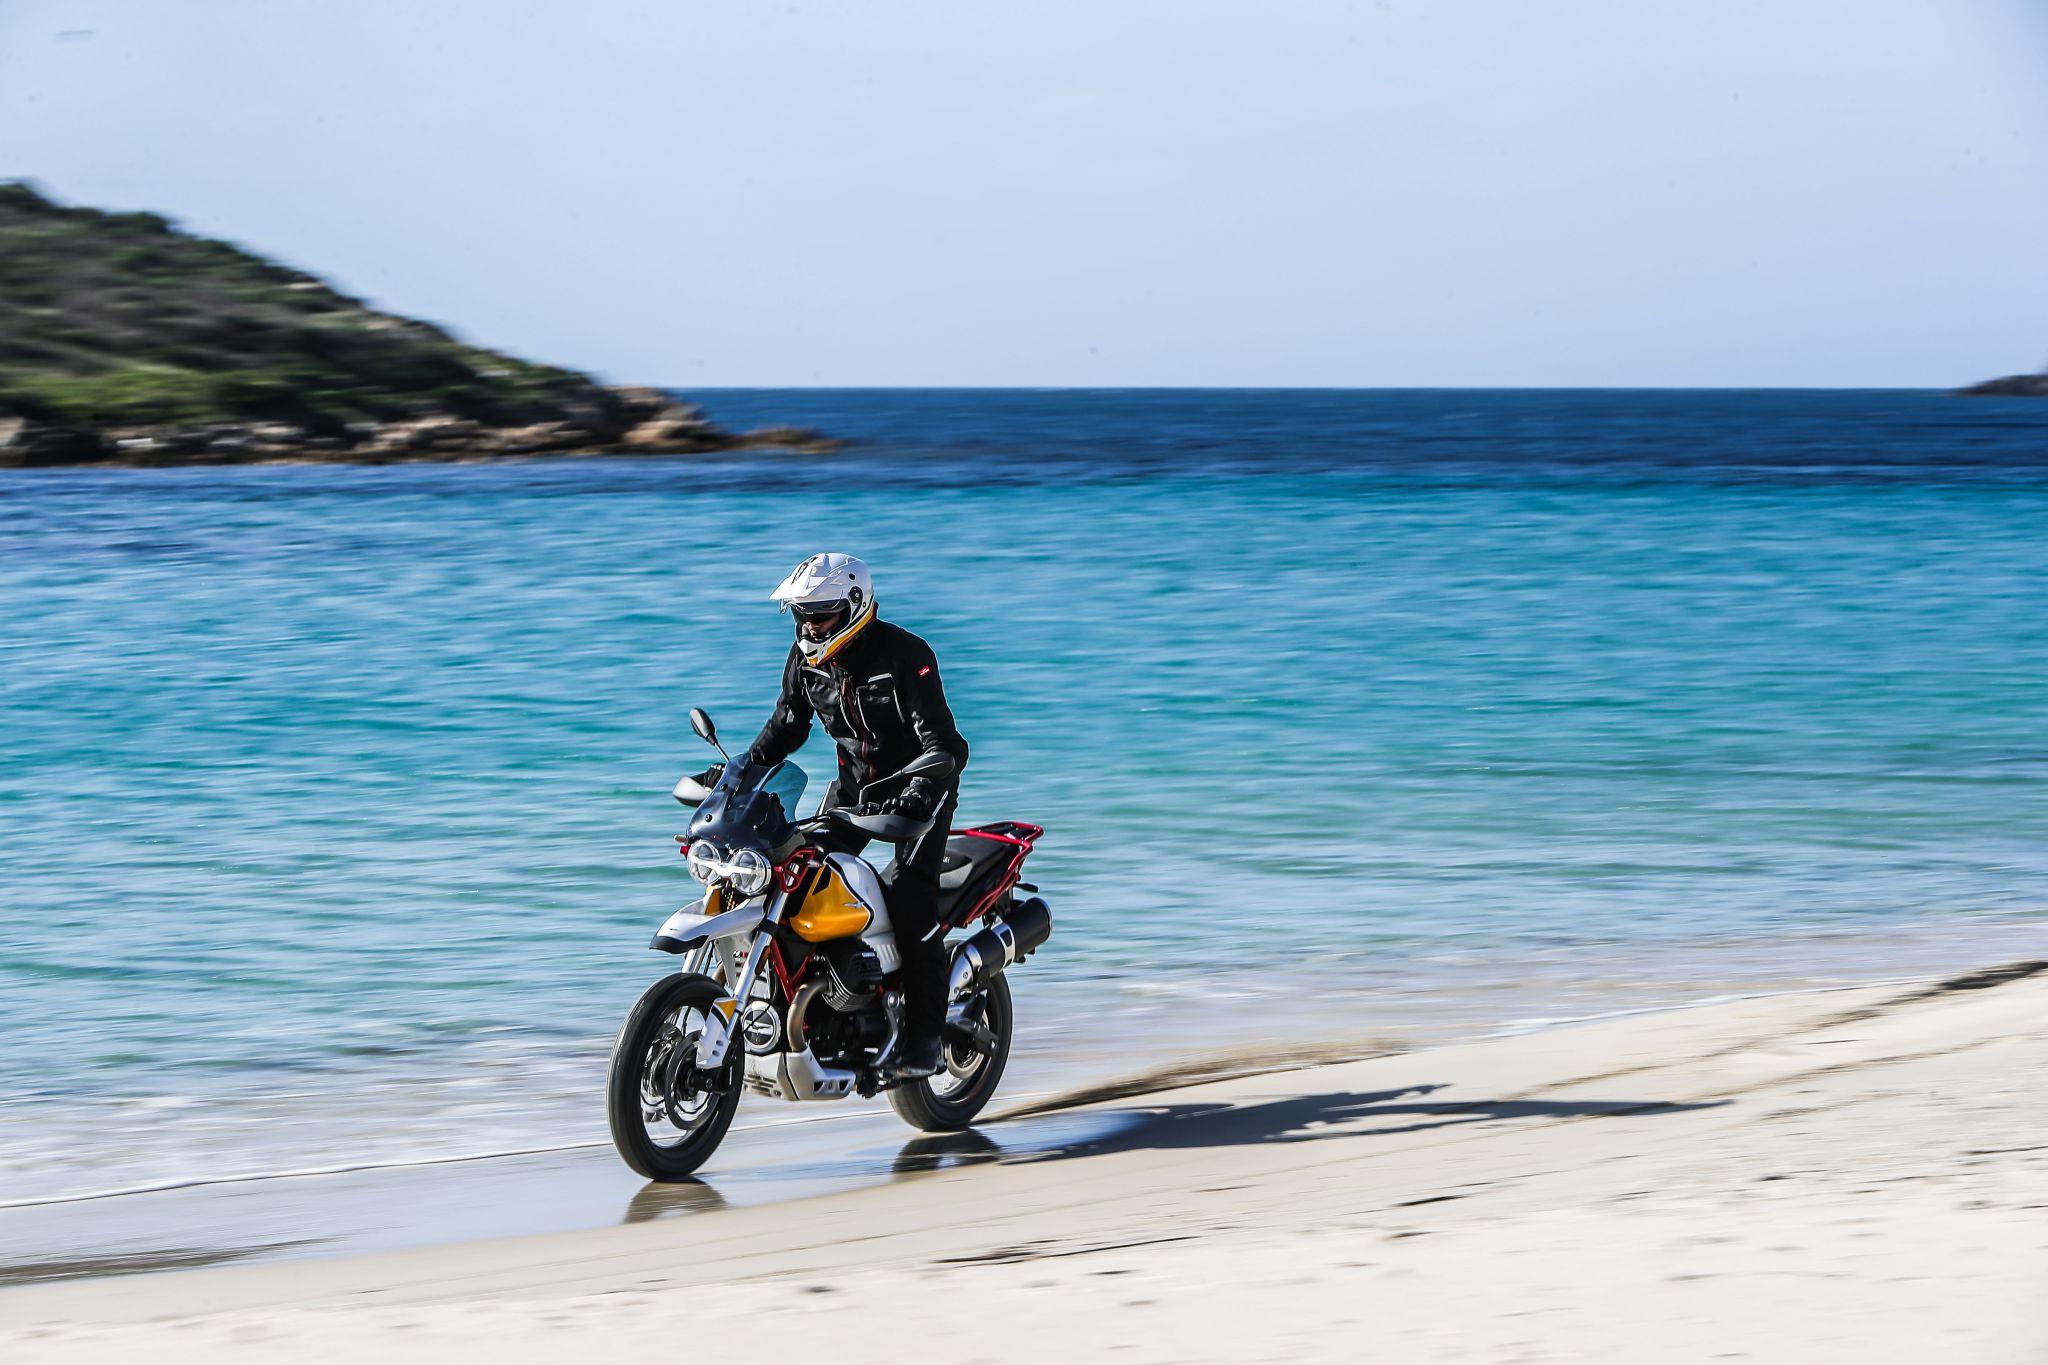 Test de V85 TT en alle andere Moto Guzzi modellen nu zelf!